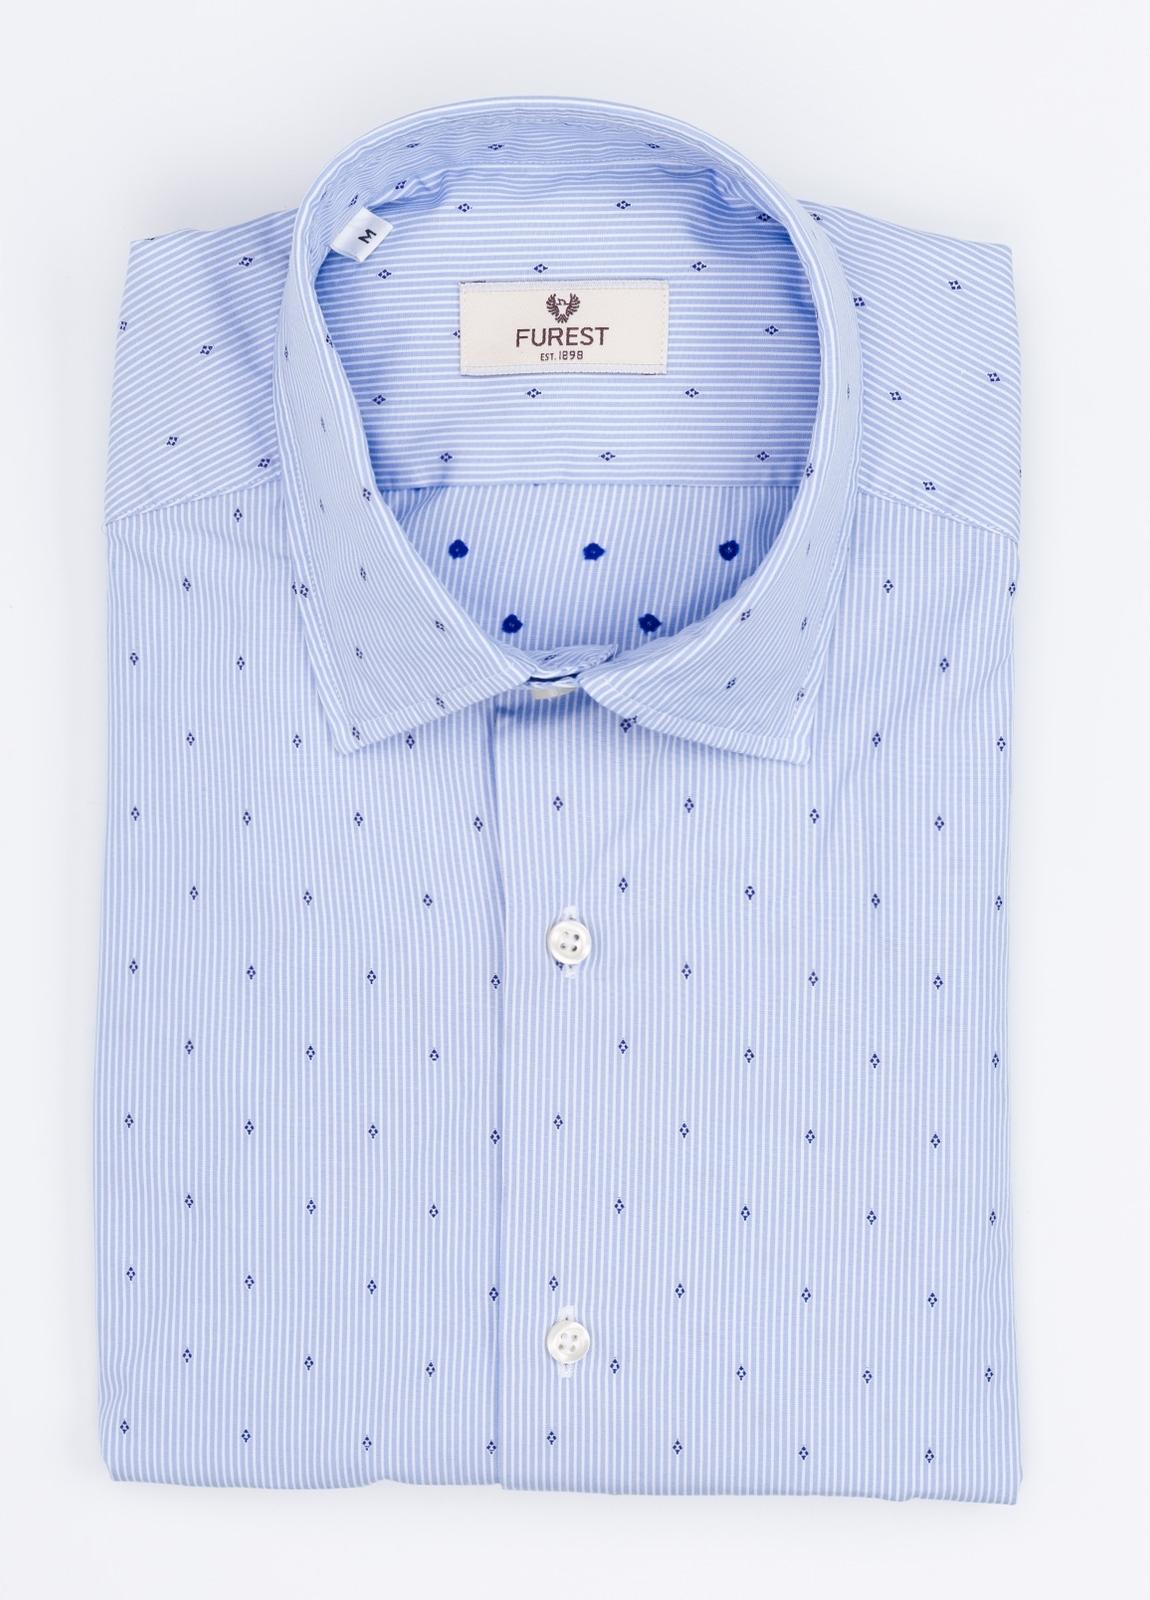 Camisa Leisure Wear SLIM FIT modelo PORTO estampado rayas con microdibujo, color celeste. 100% Algodón.